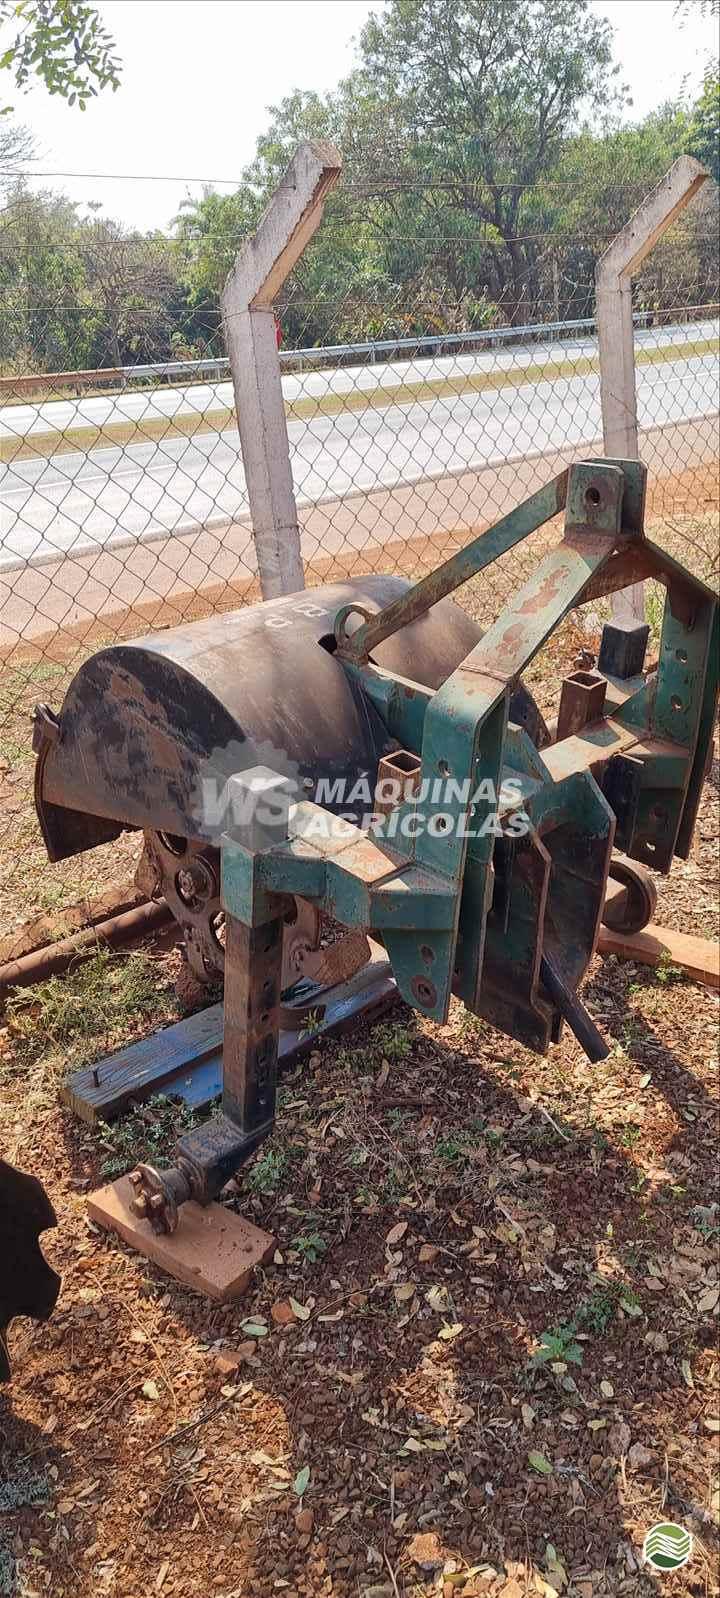 IMPLEMENTOS AGRICOLAS VALETADEIRA VALETADEIRA ROTATIVA WS Máquinas Agrícolas SERTAOZINHO SÃO PAULO SP